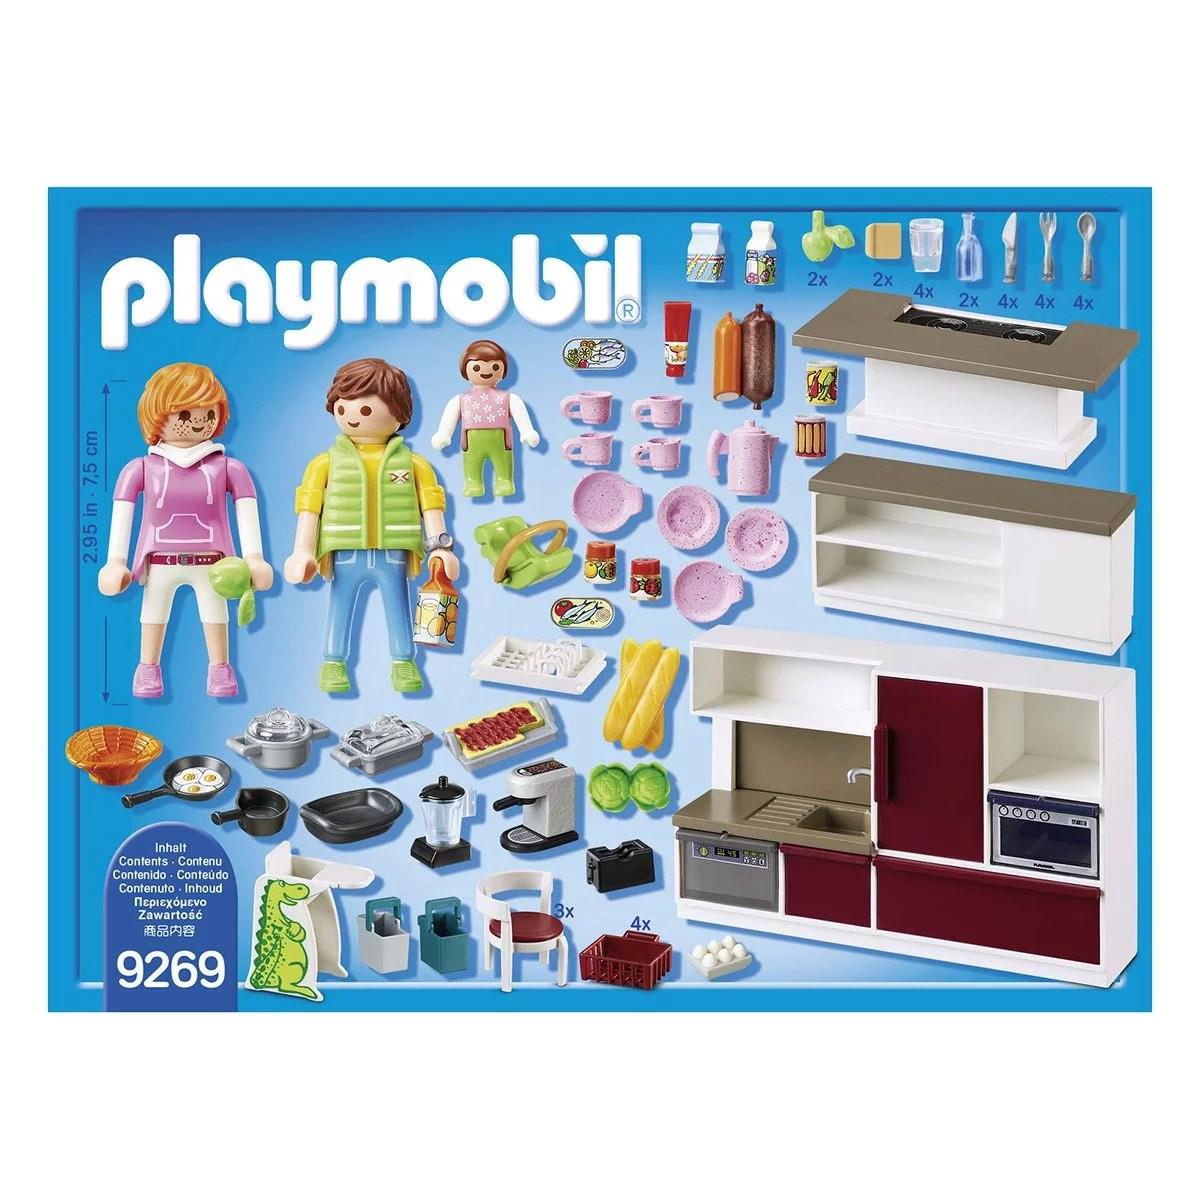 cuisine amenagee playmobil city life